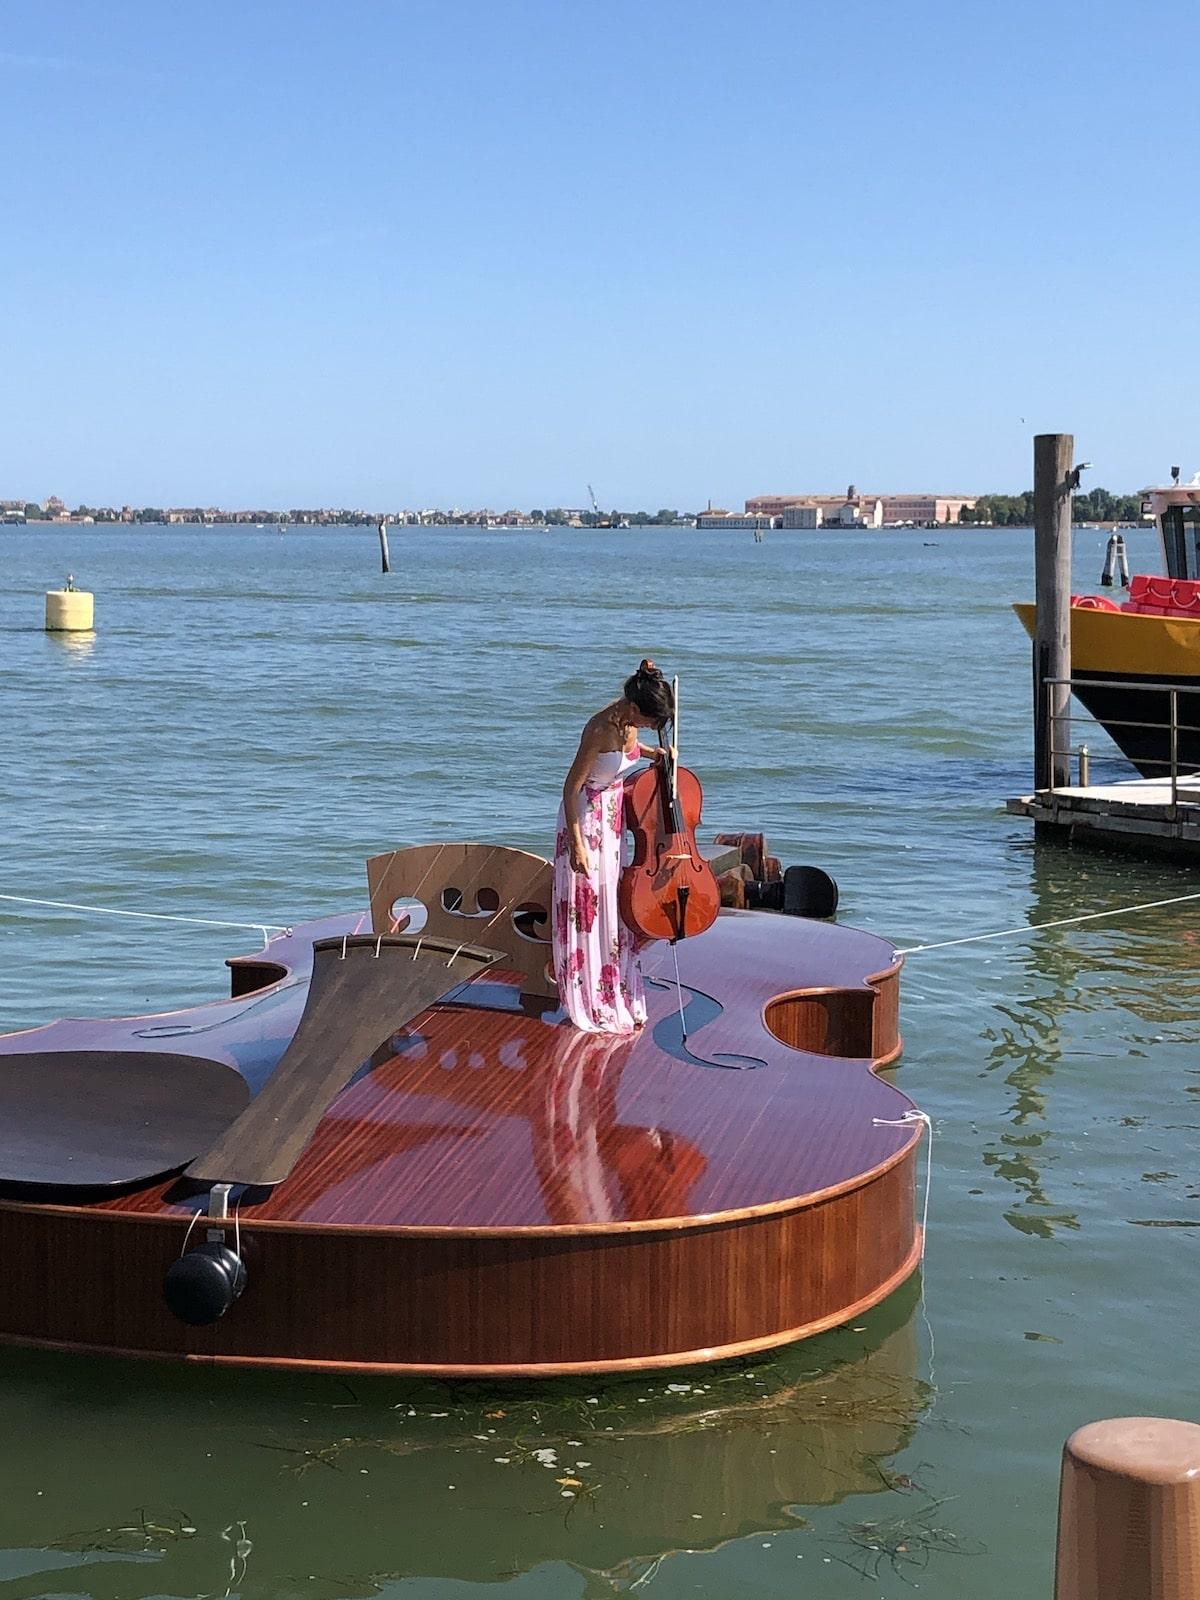 Violin Public Art Installation in Venice